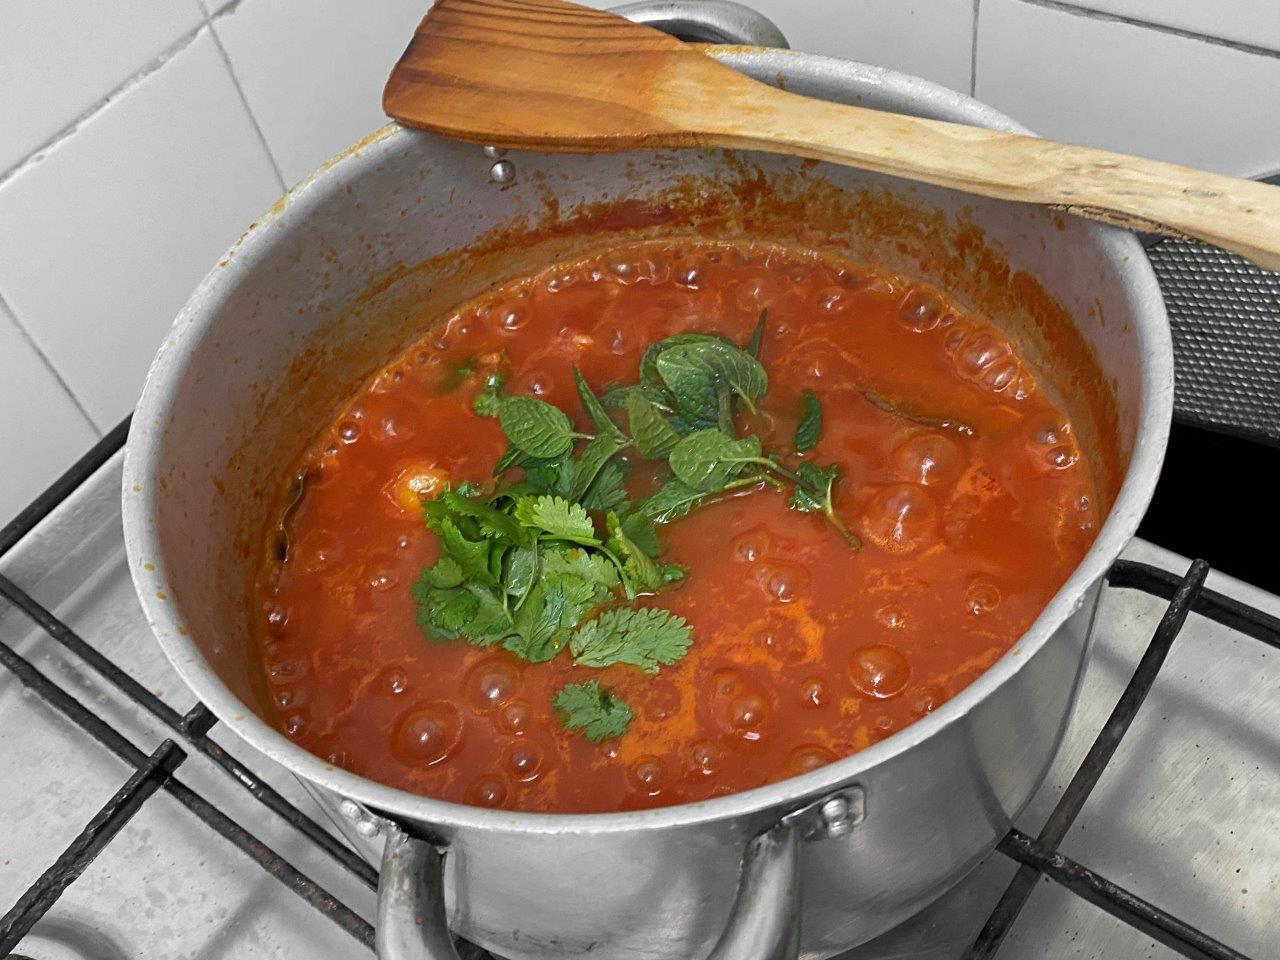 Arroz de tomate cremoso Arroz de tomate cremoso 4